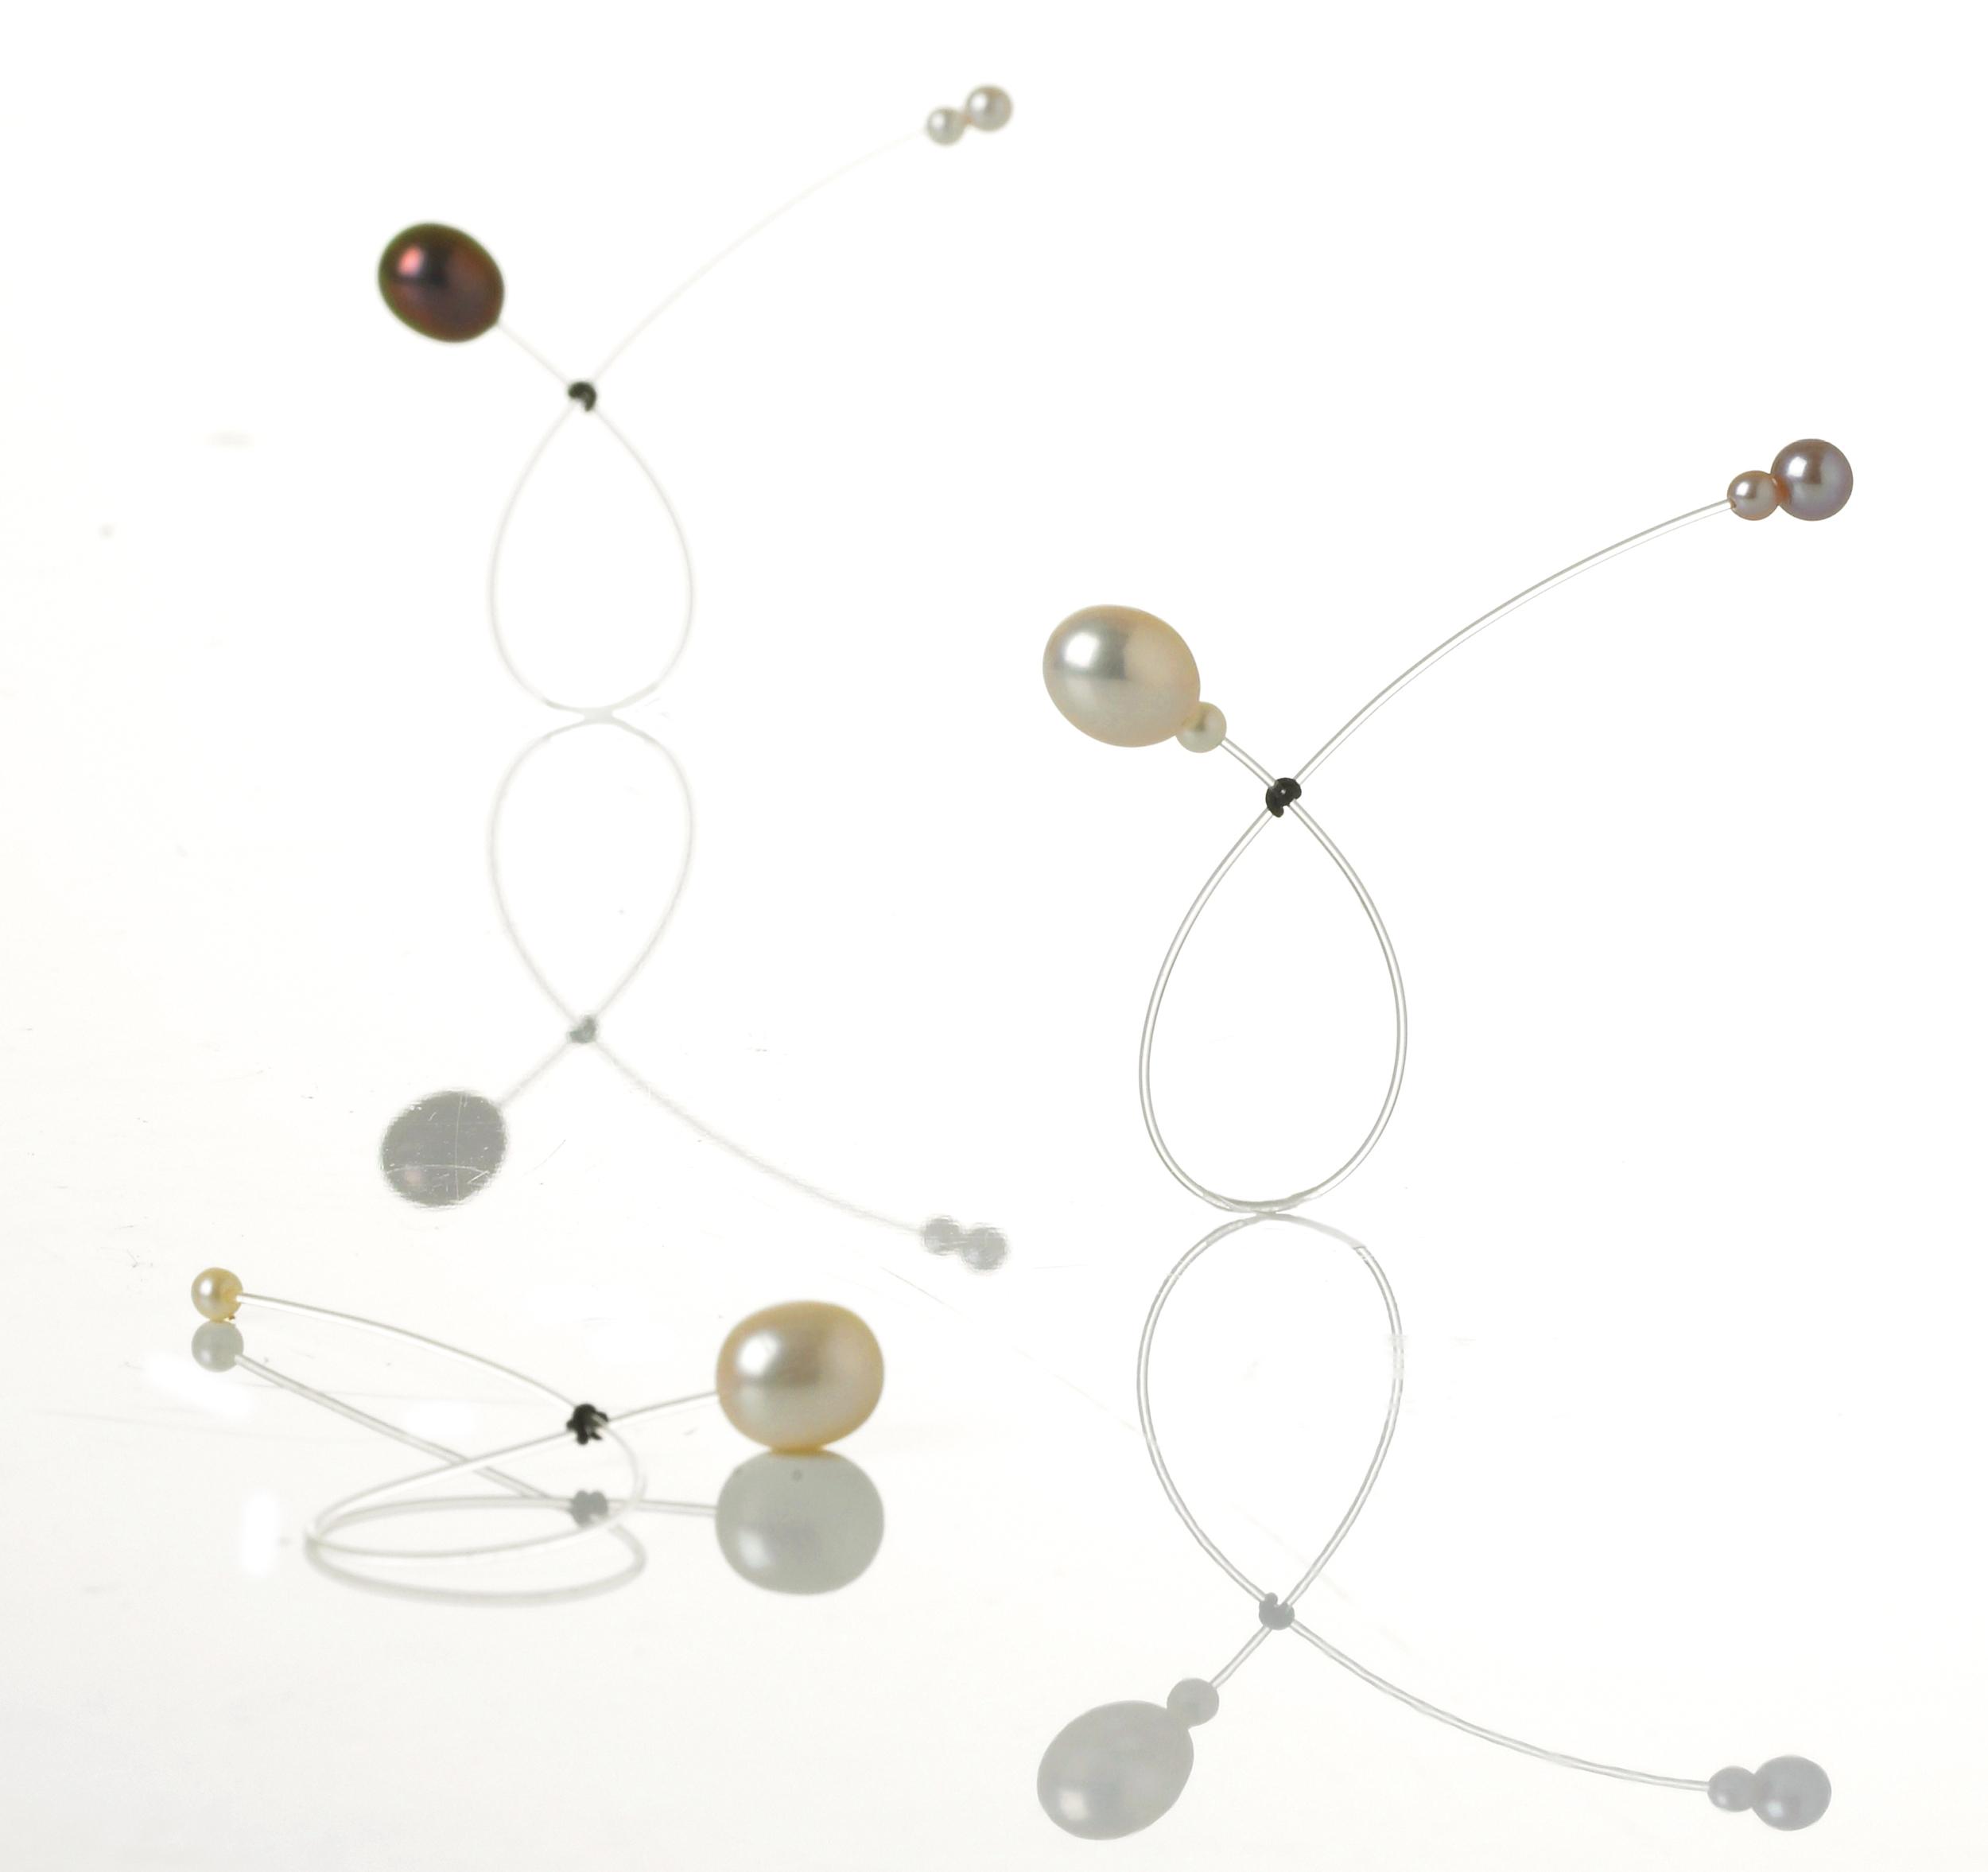 Klare+ringe+med+perle.jpg